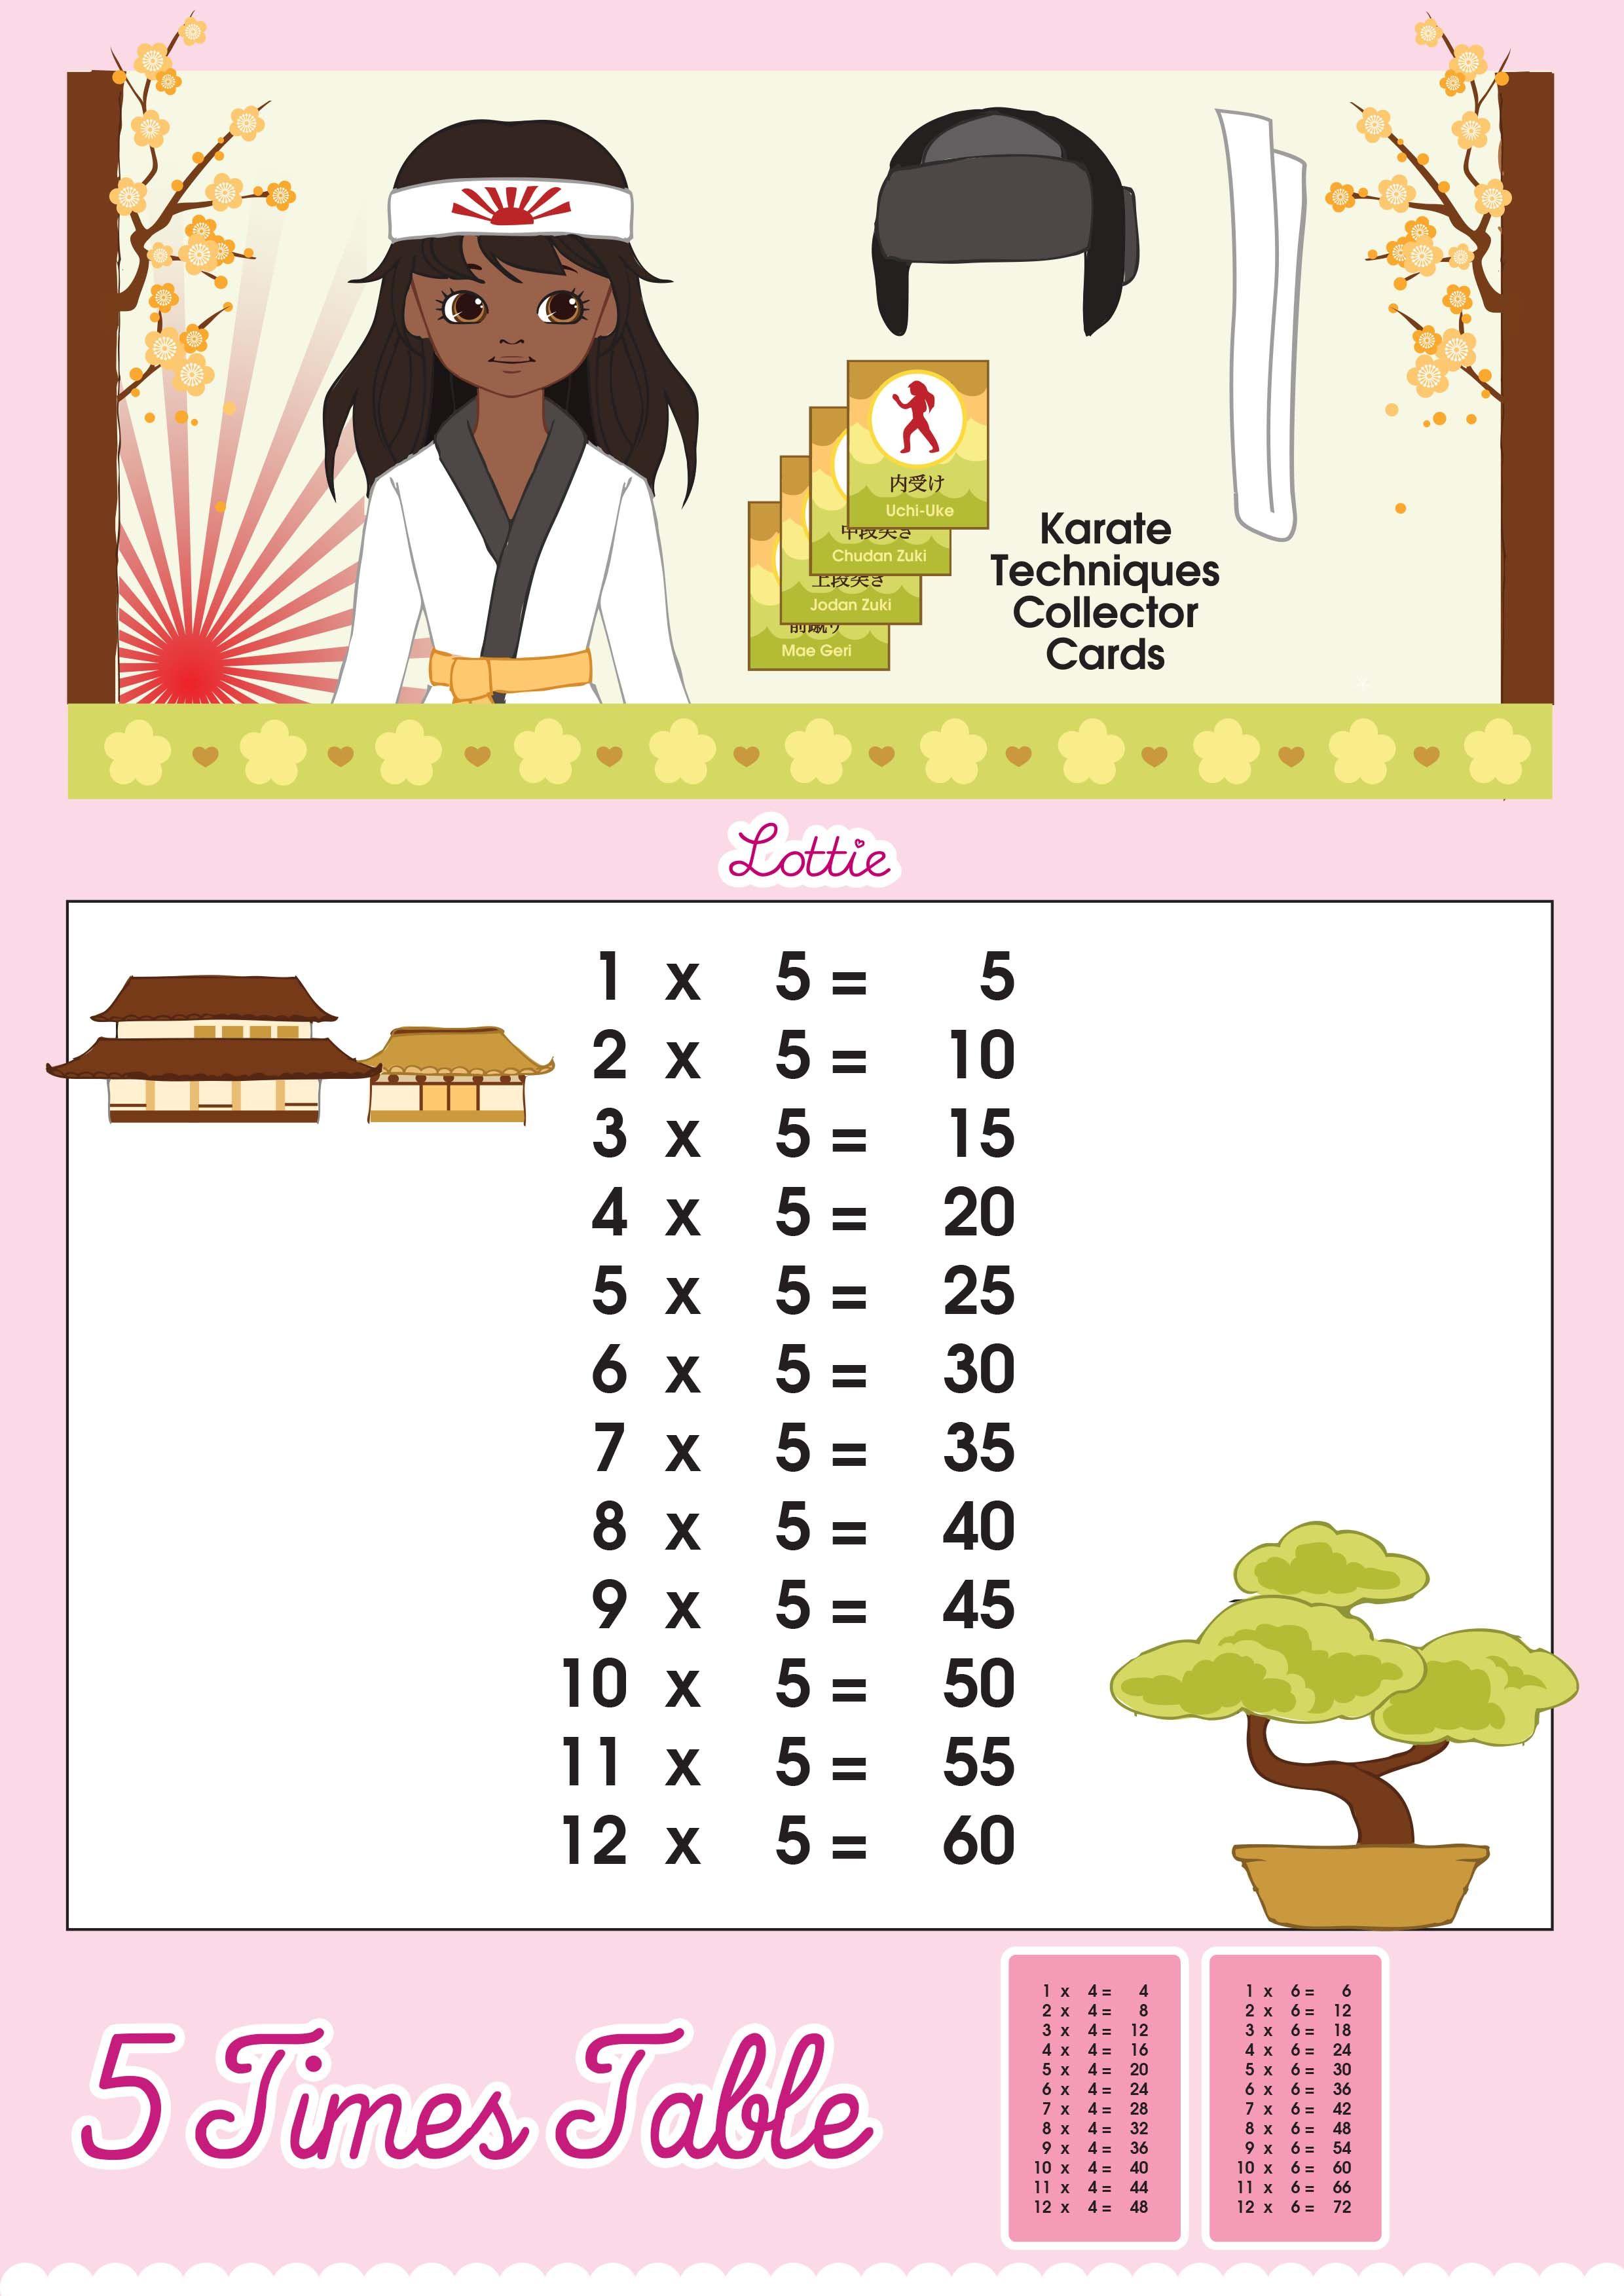 5 times table printable chart times tables free printables and 5 times table printable chart gamestrikefo Choice Image